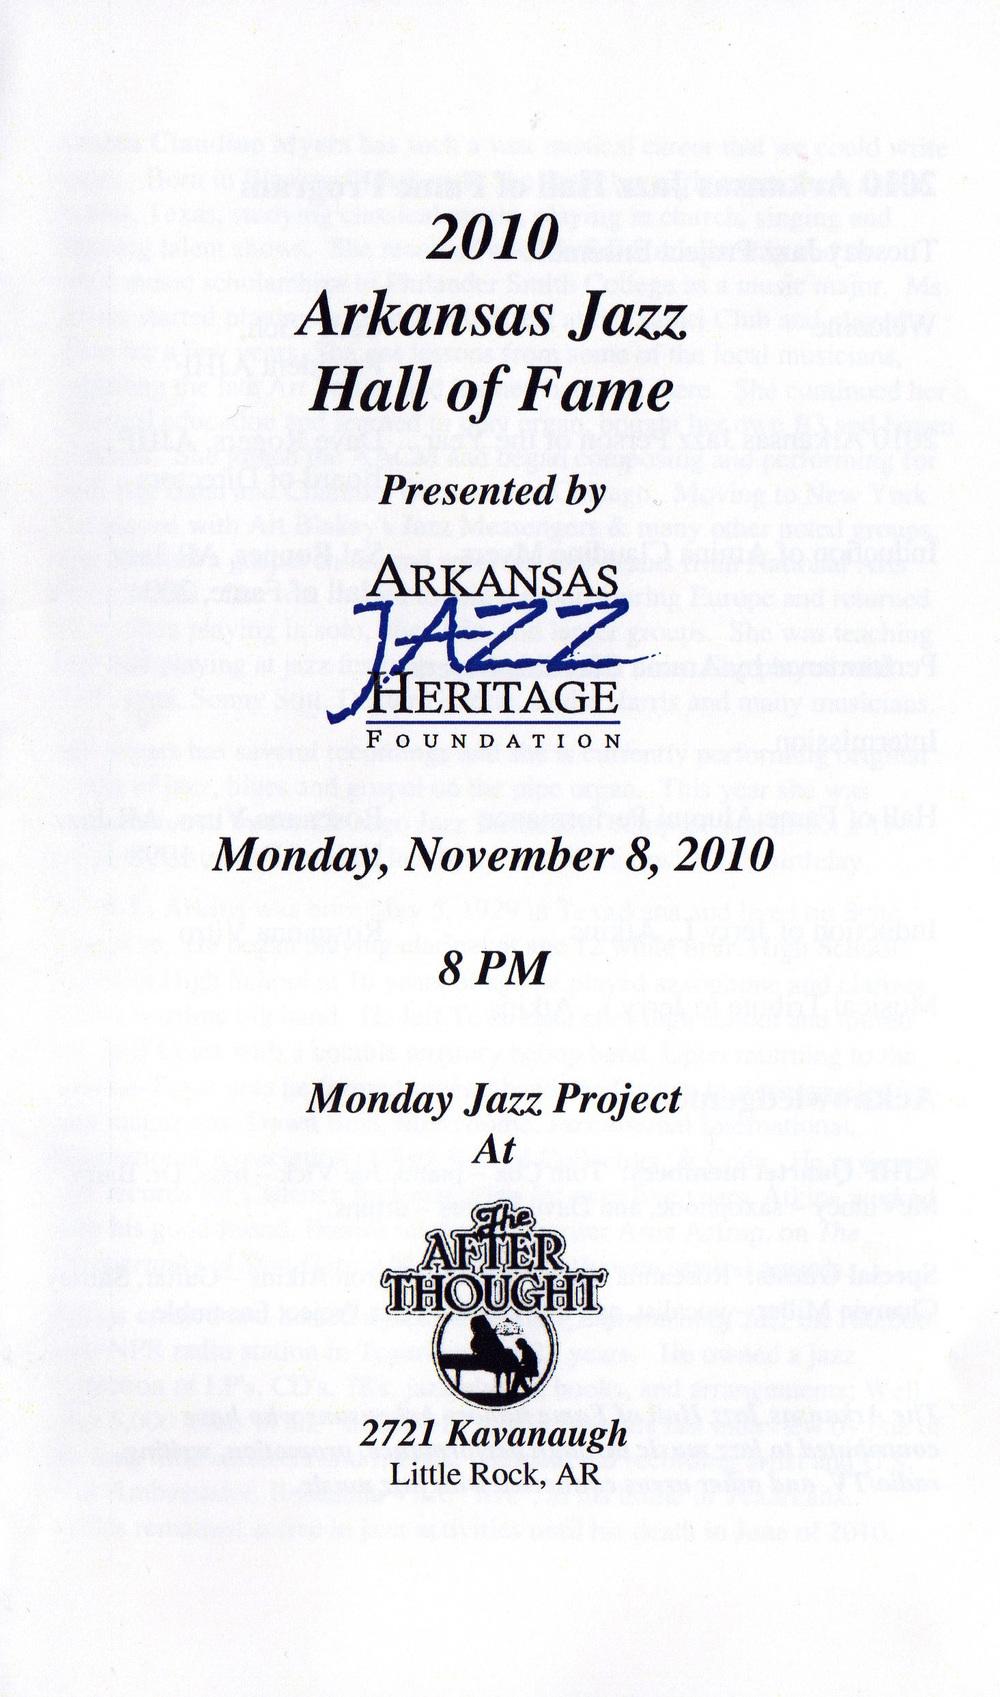 Arkansas Jazz Hall of Fame.jpeg